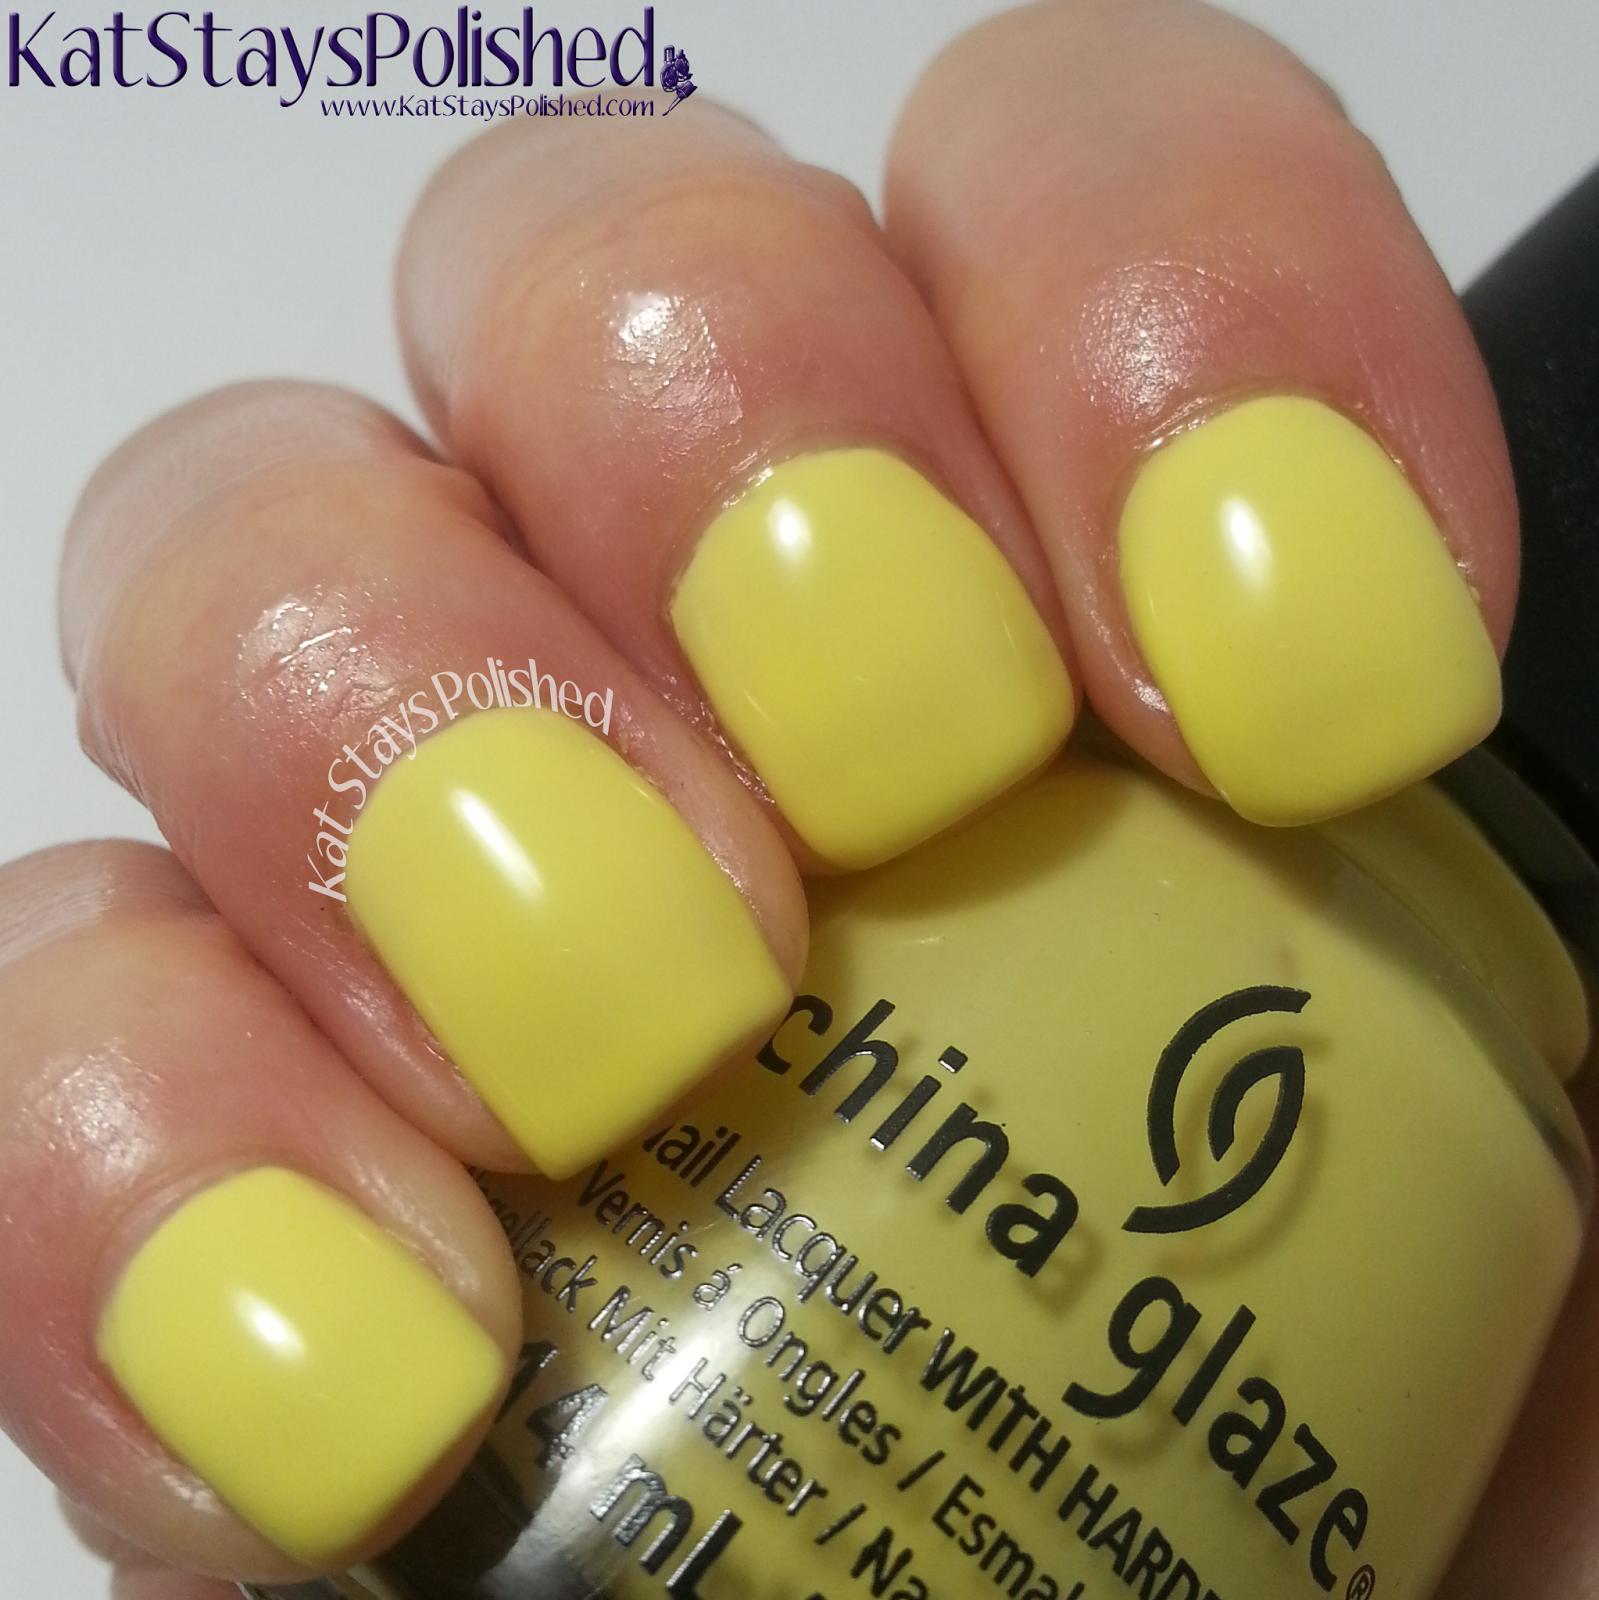 China Glaze Off Shore - Sun Upon My Skin | Kat Stays Polished @chinaglaze @sallybeauty